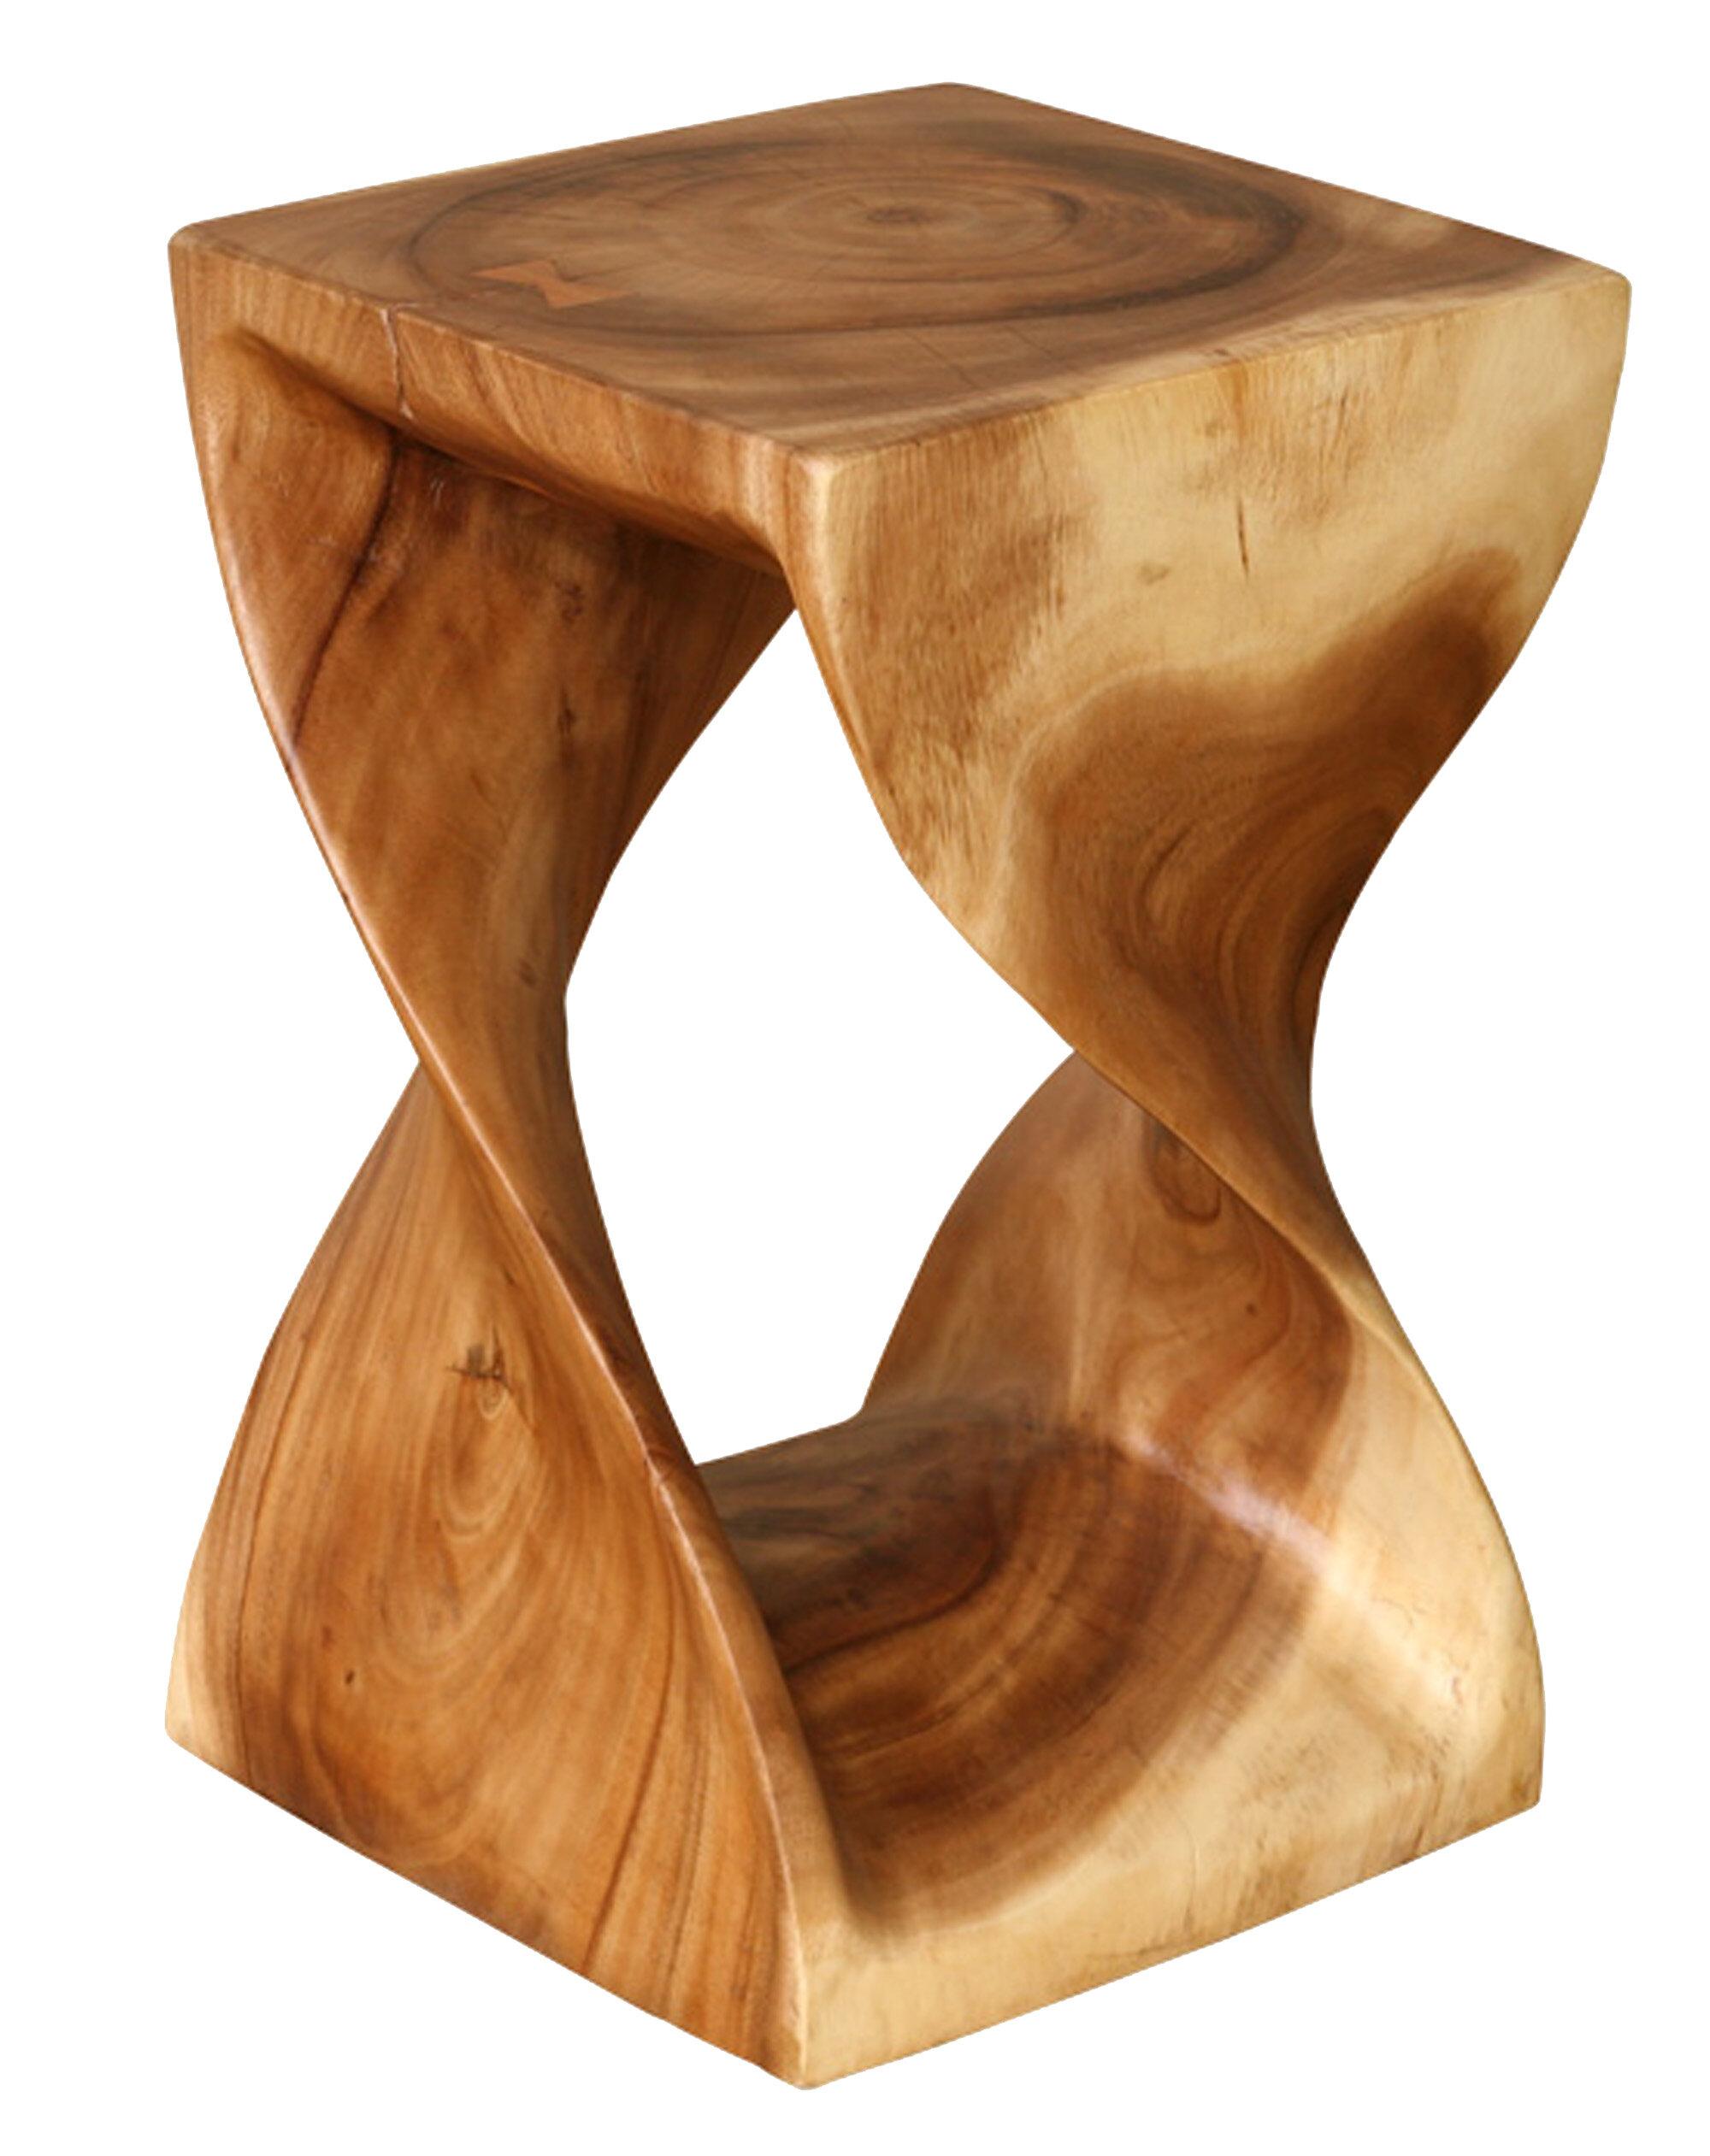 Asian Art Imports Natural Wood Twist Stool & Reviews   Wayfair